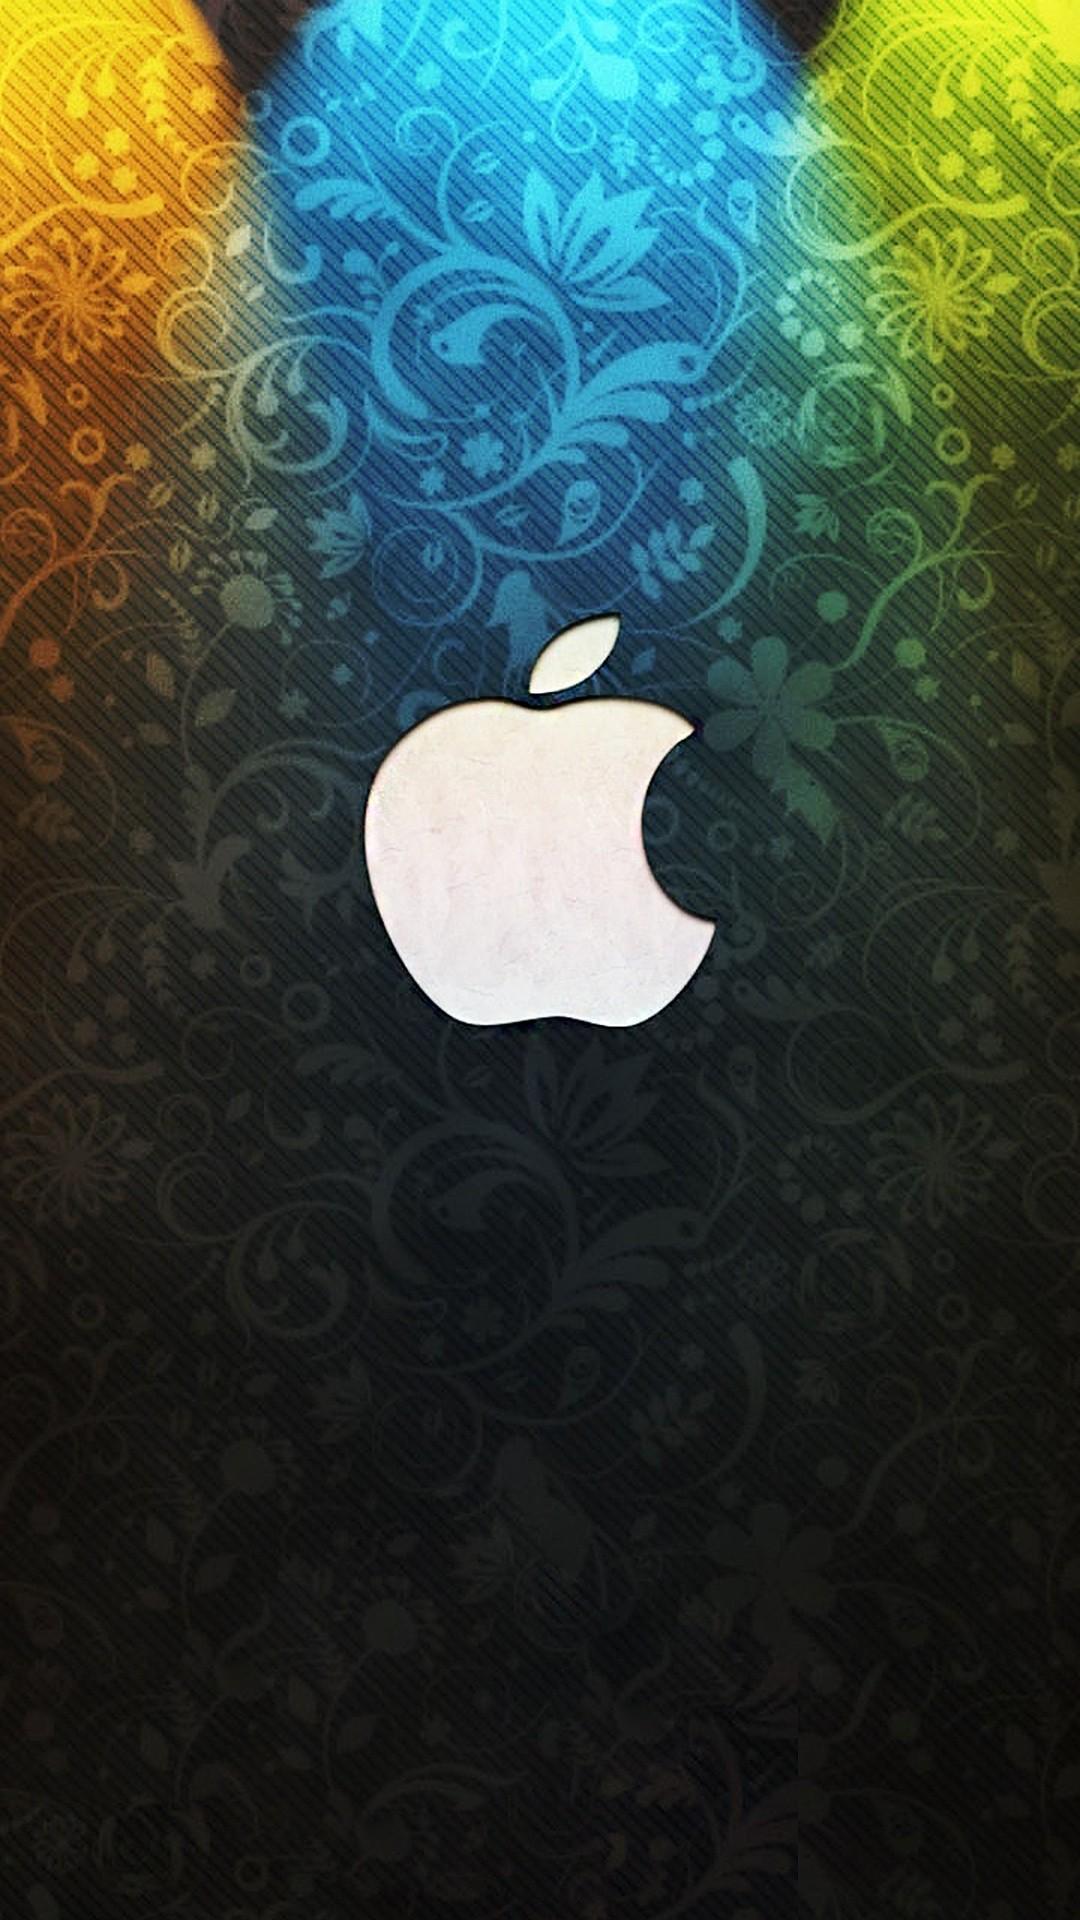 Cool Lockscreens iPhone wallpaper